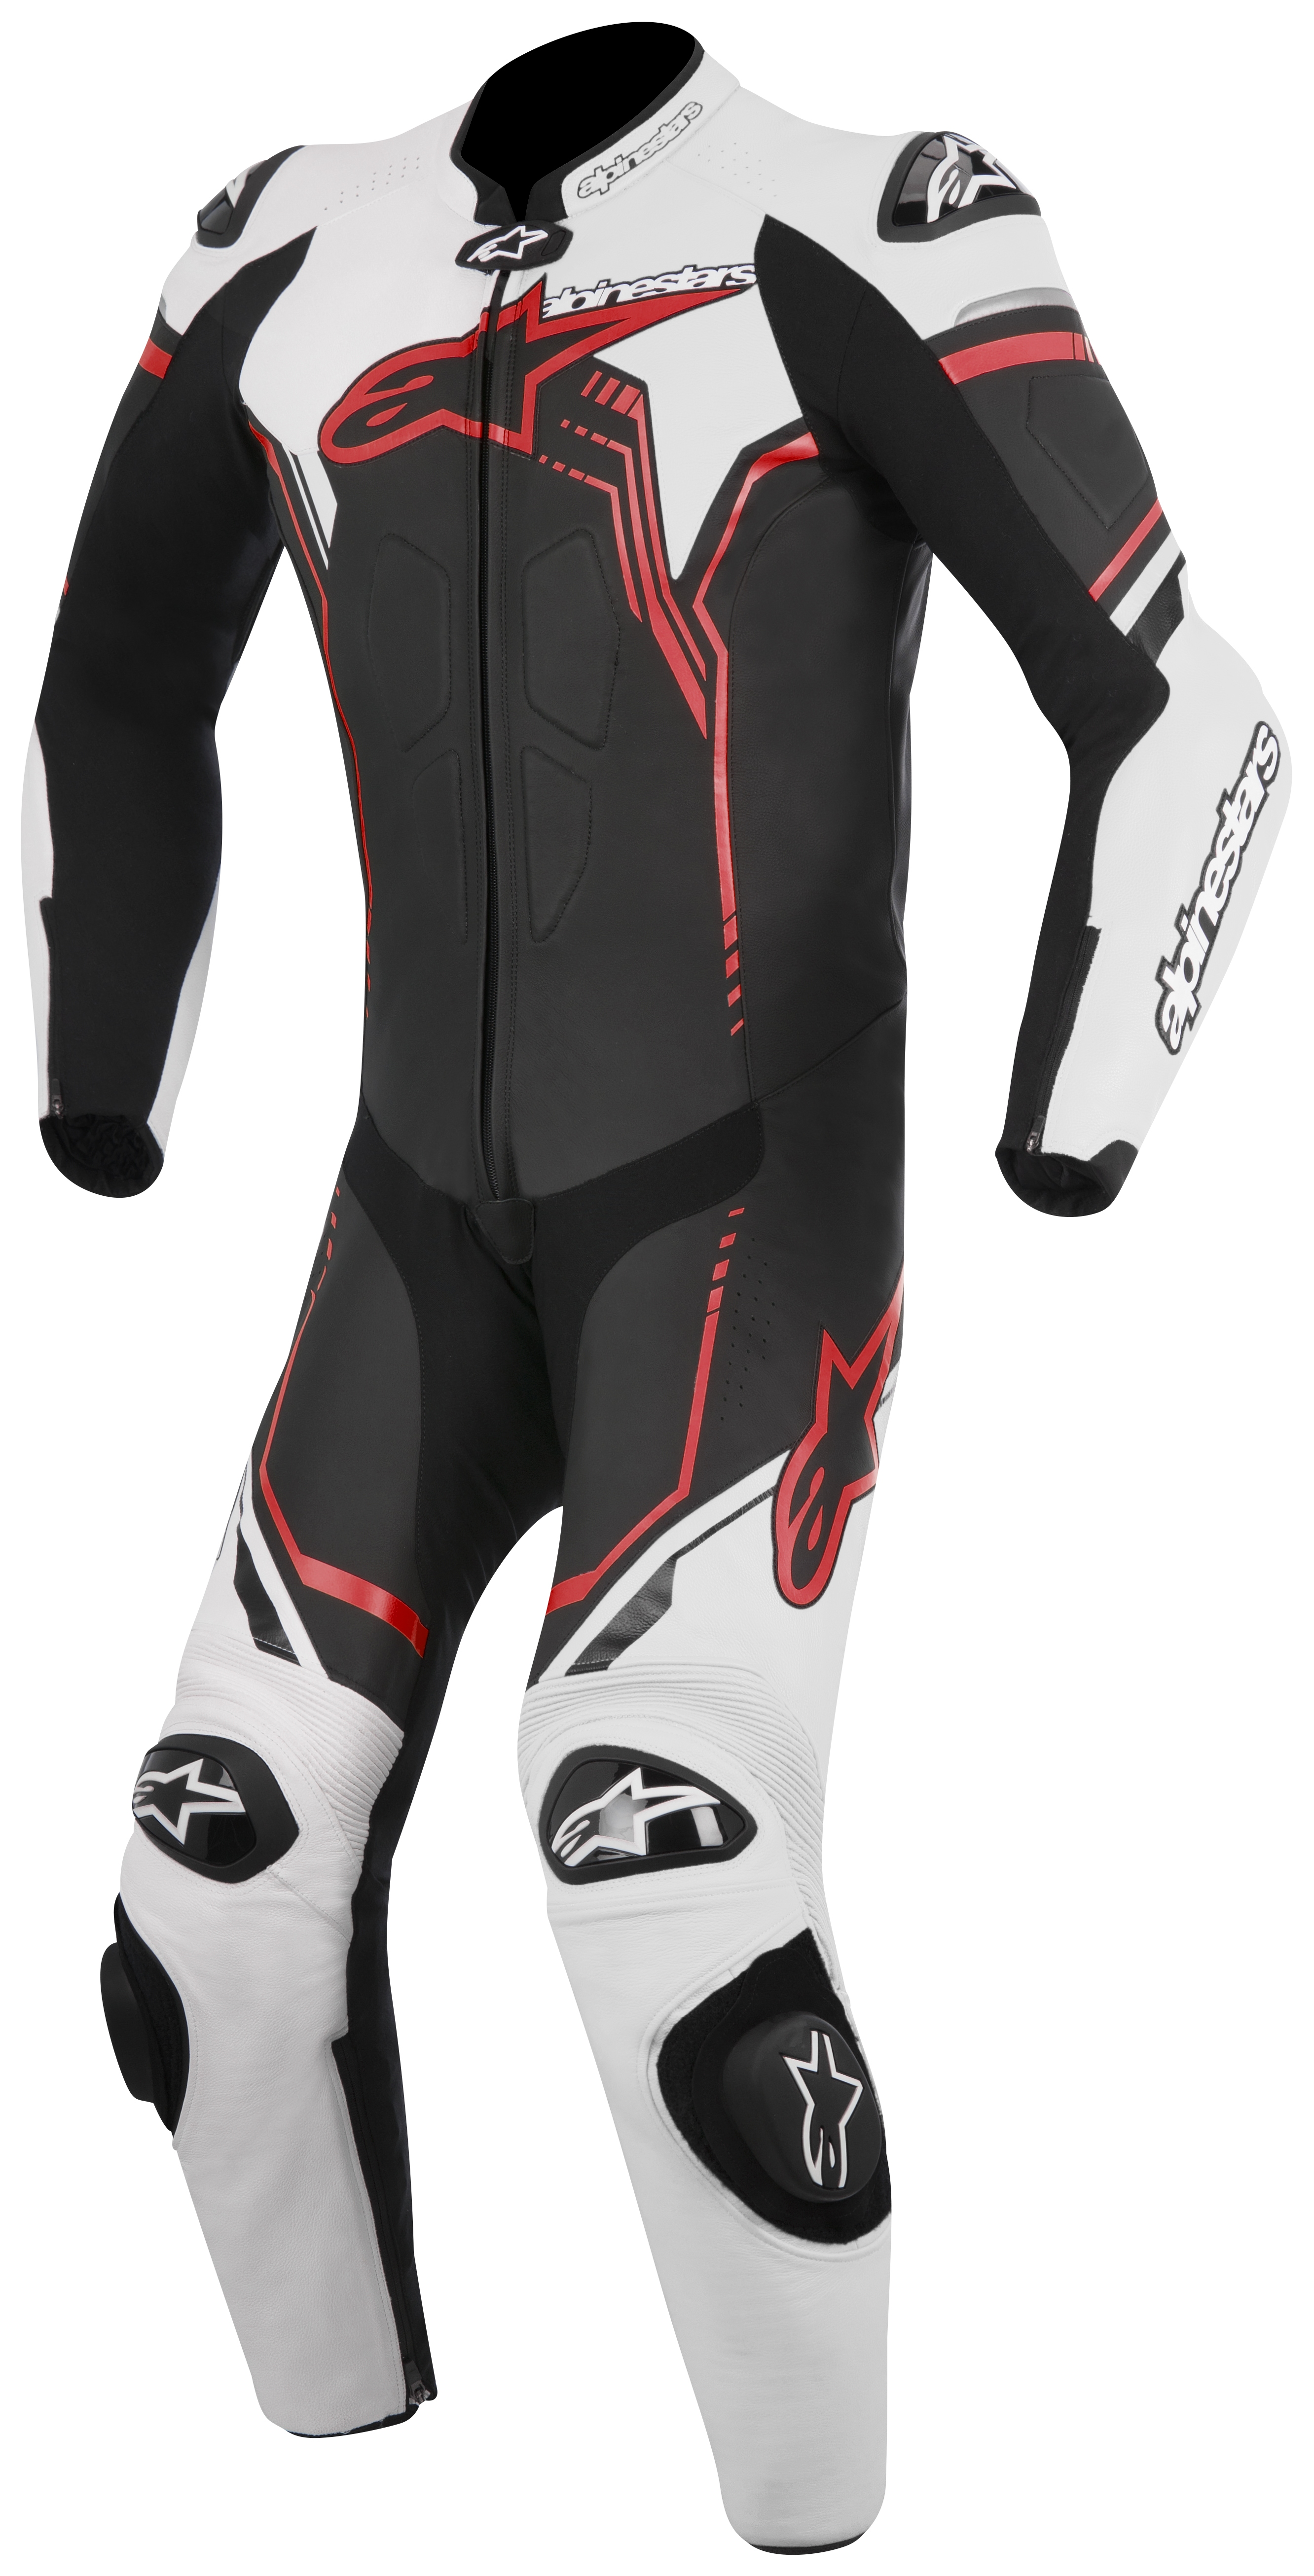 alpinestars gp plus race suit 20 off revzilla. Black Bedroom Furniture Sets. Home Design Ideas